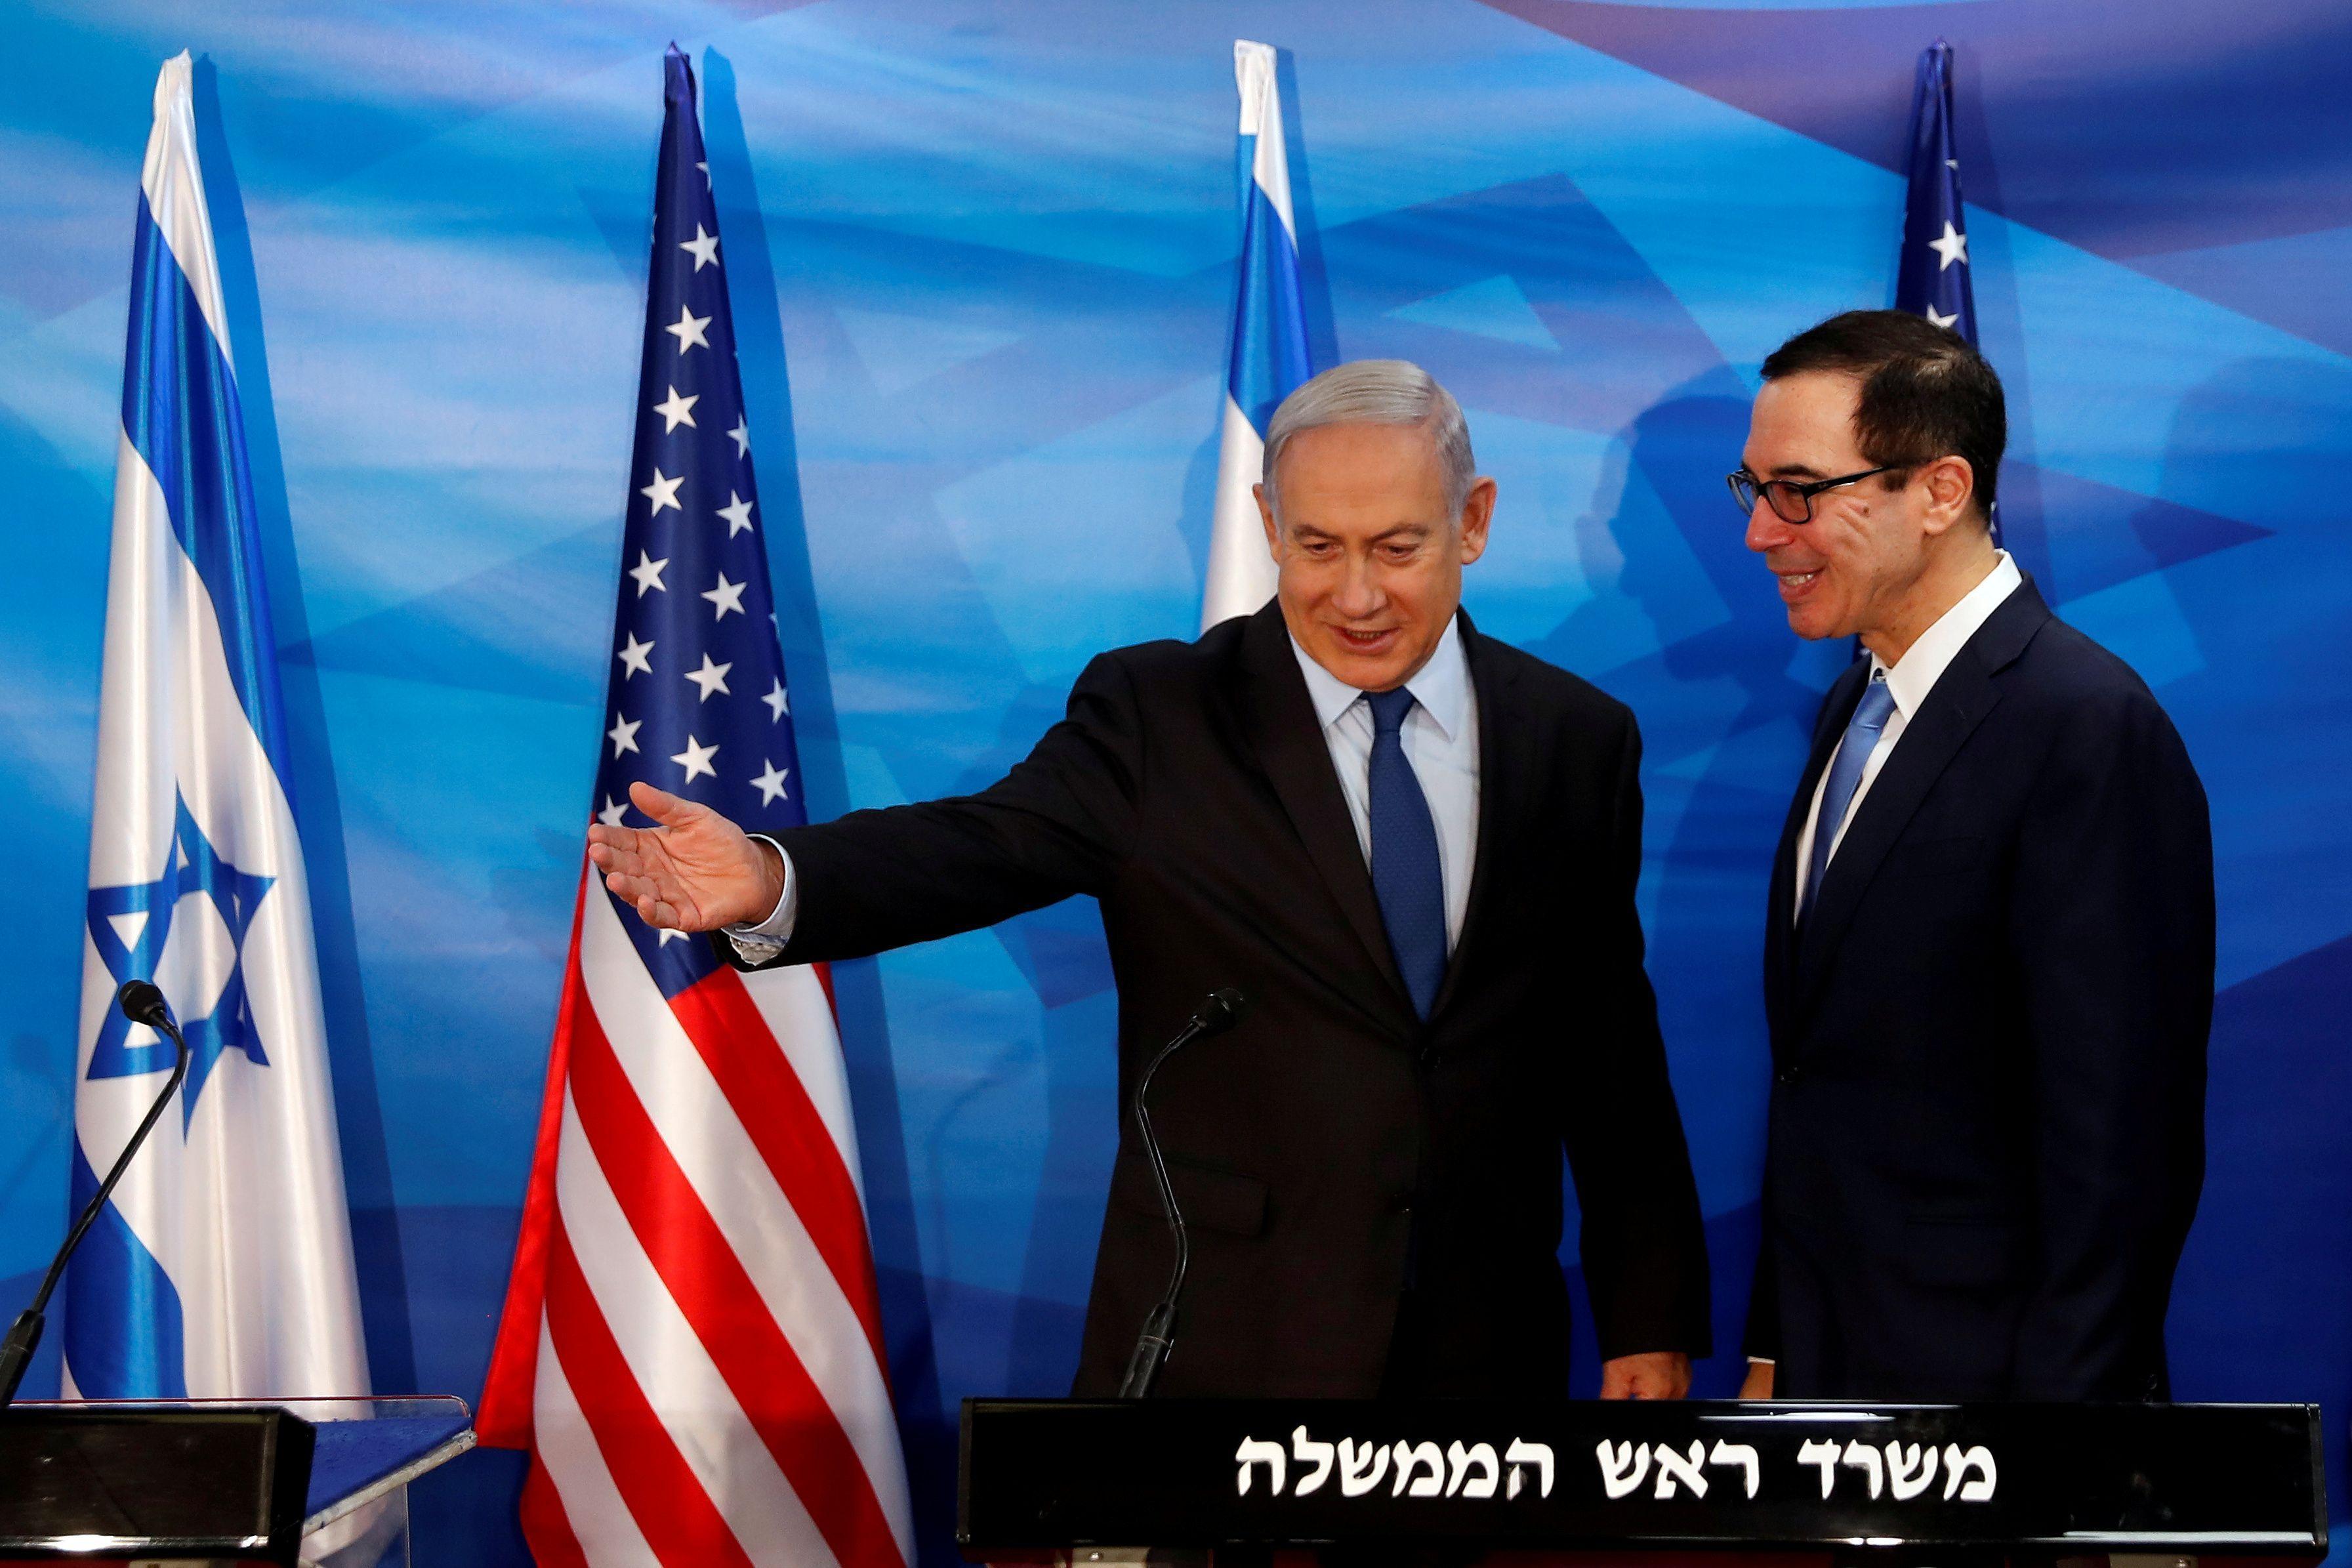 2019-10-28T163924Z_597265585_RC173B419C90_RTRMADP_3_ISRAEL-IRAN-YEMEN